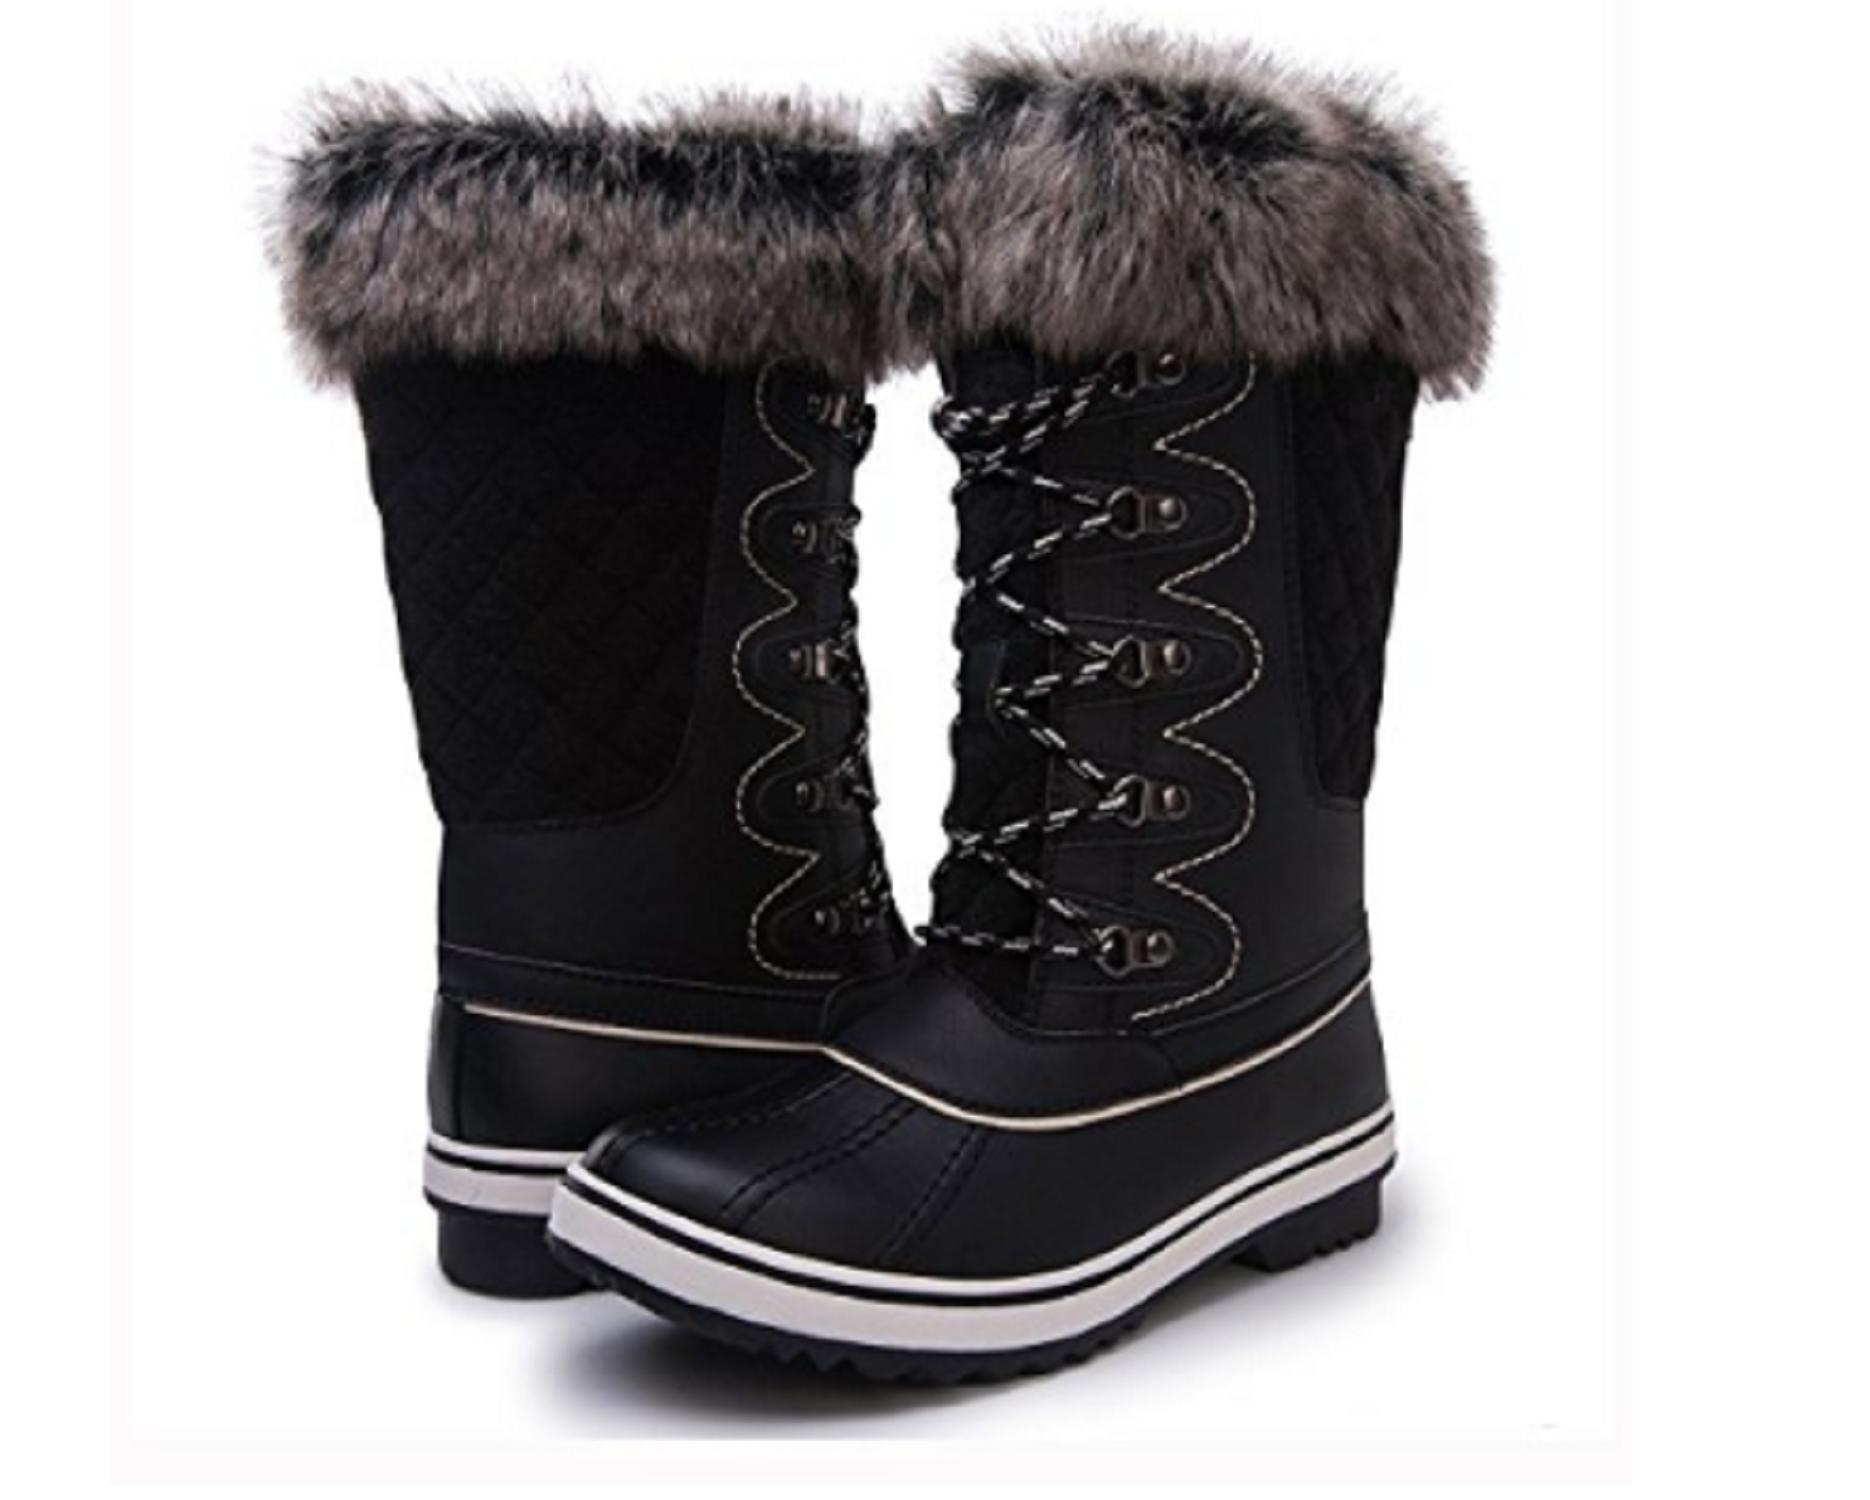 Women's Globalwin Waterproof Winter Boots.